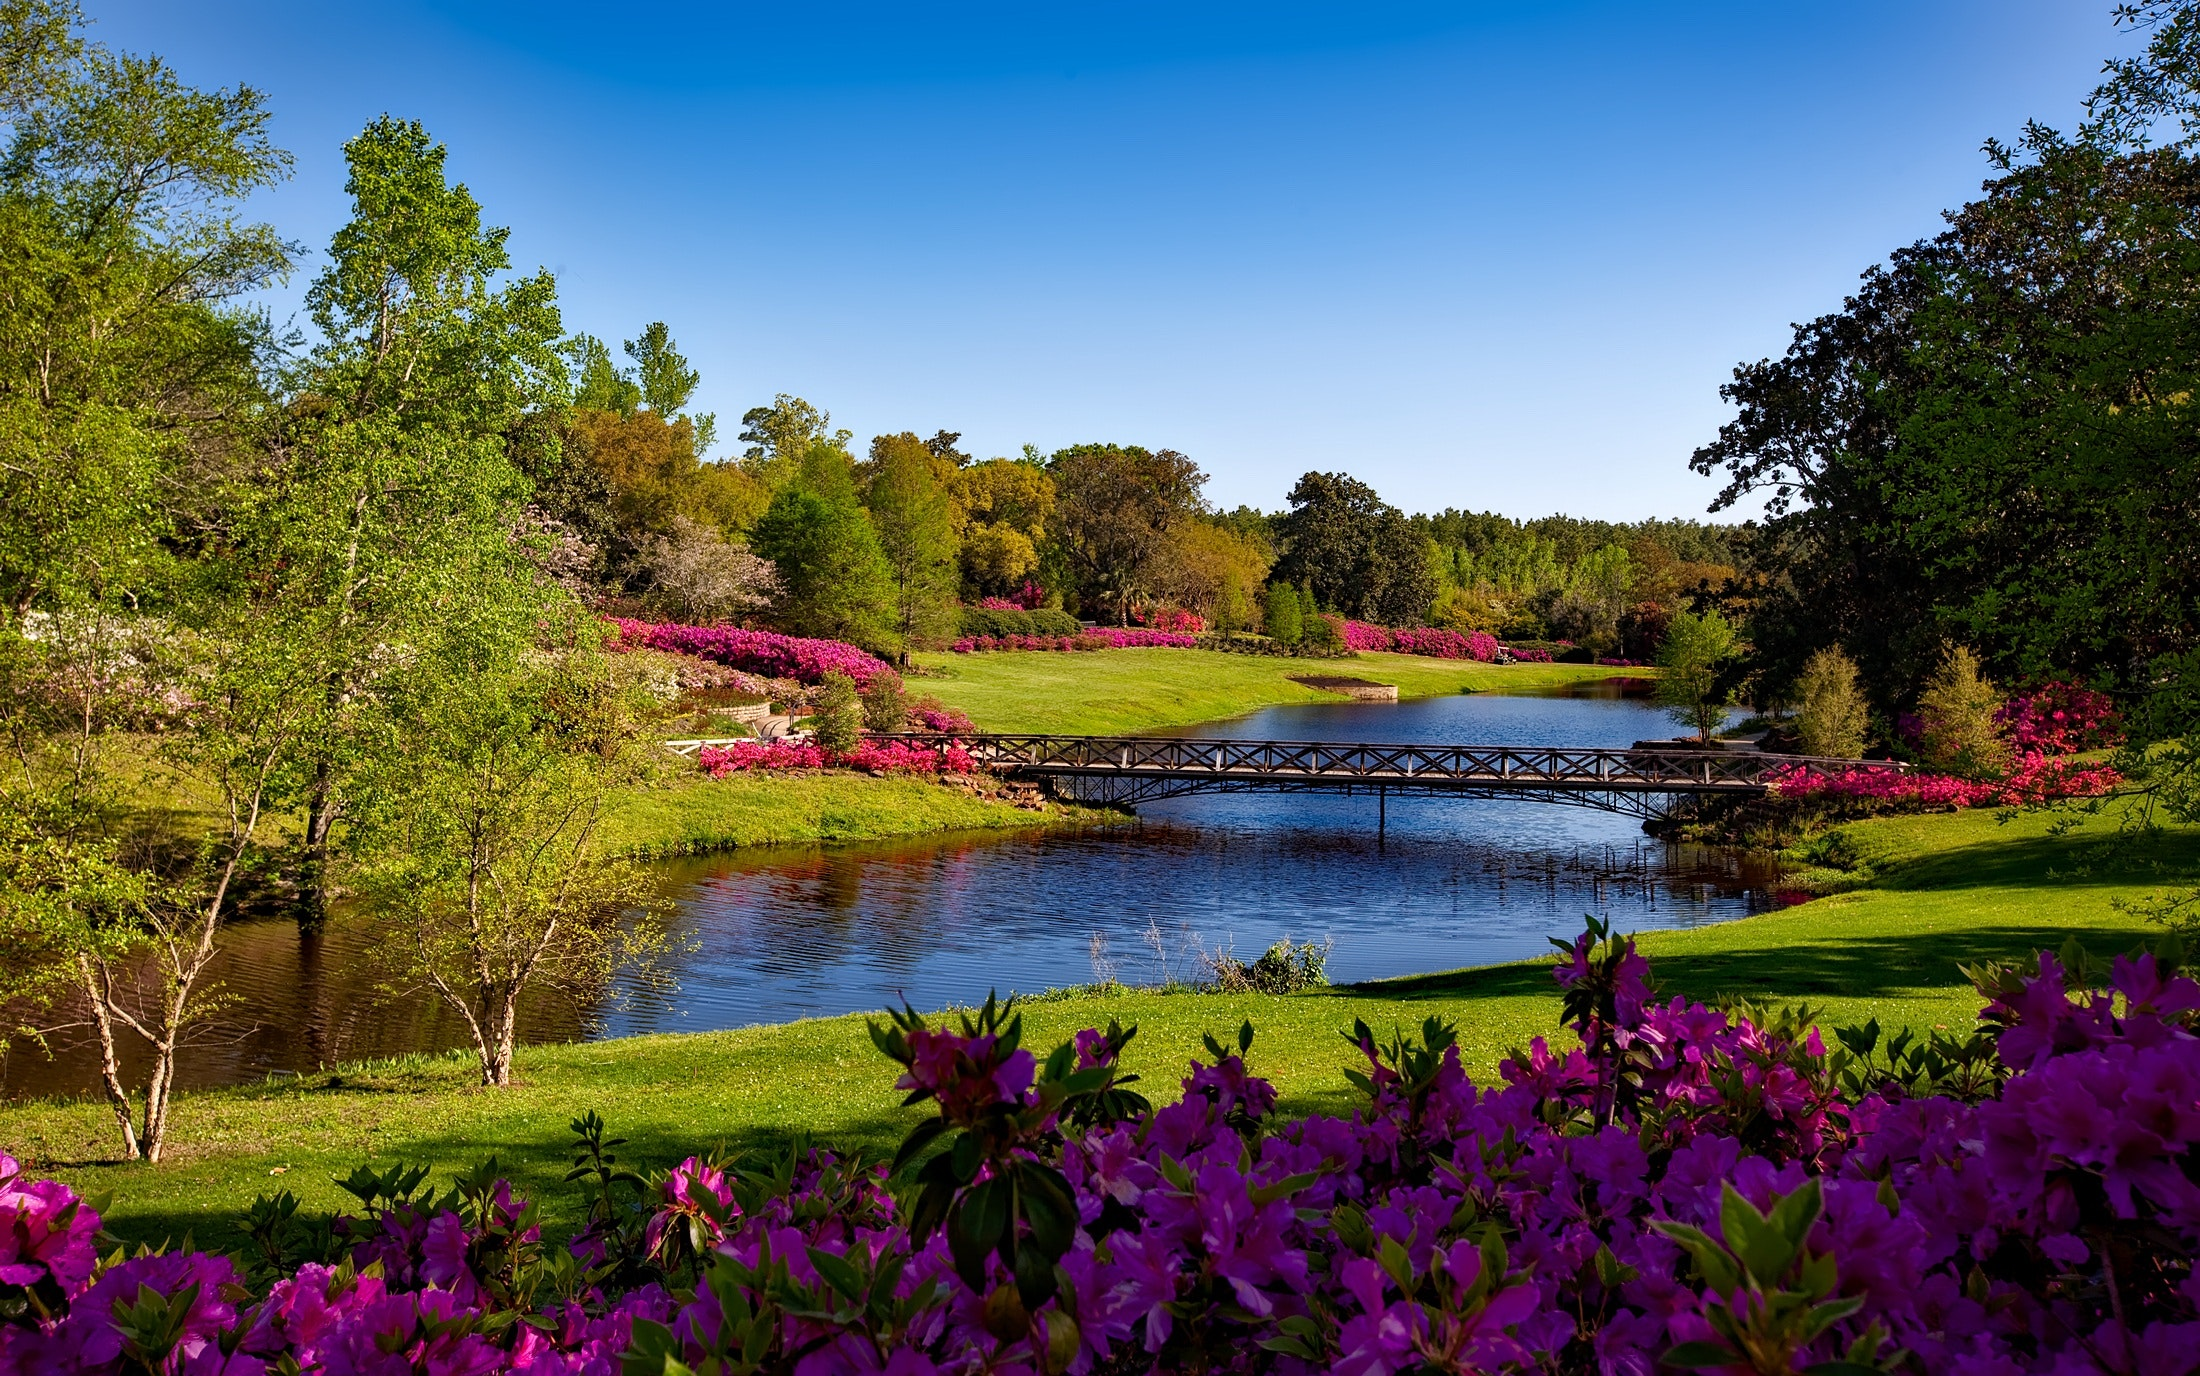 Most Inspiring Wallpaper High Resolution Scenery - bellingrath-gardens-alabama-landscape-scenic-158063  Picture_33308.jpg\u0026fm\u003djpg